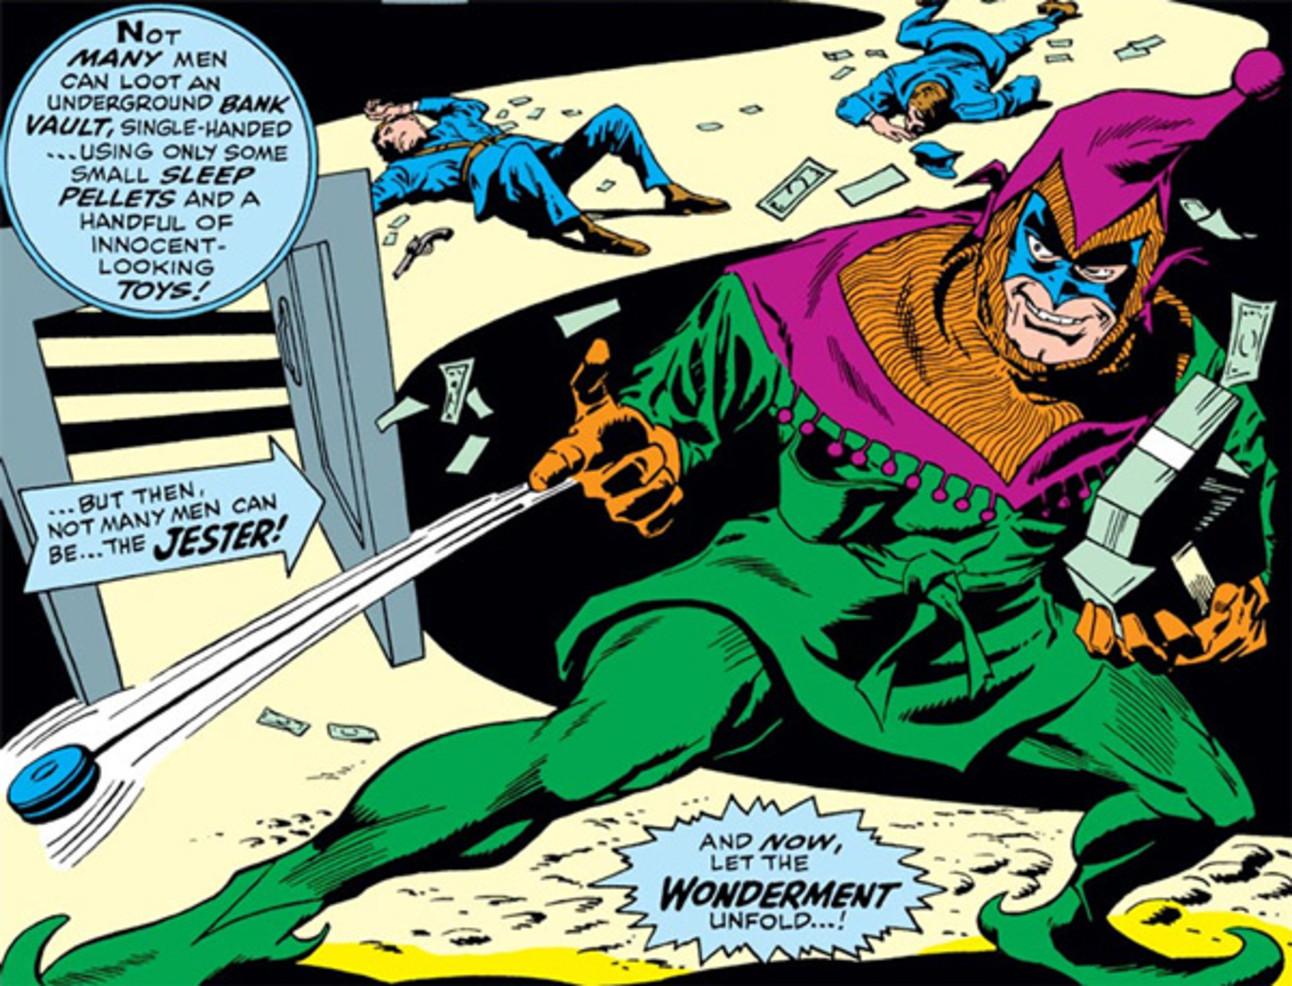 Jester_Powers_Marvel_h1.jpg